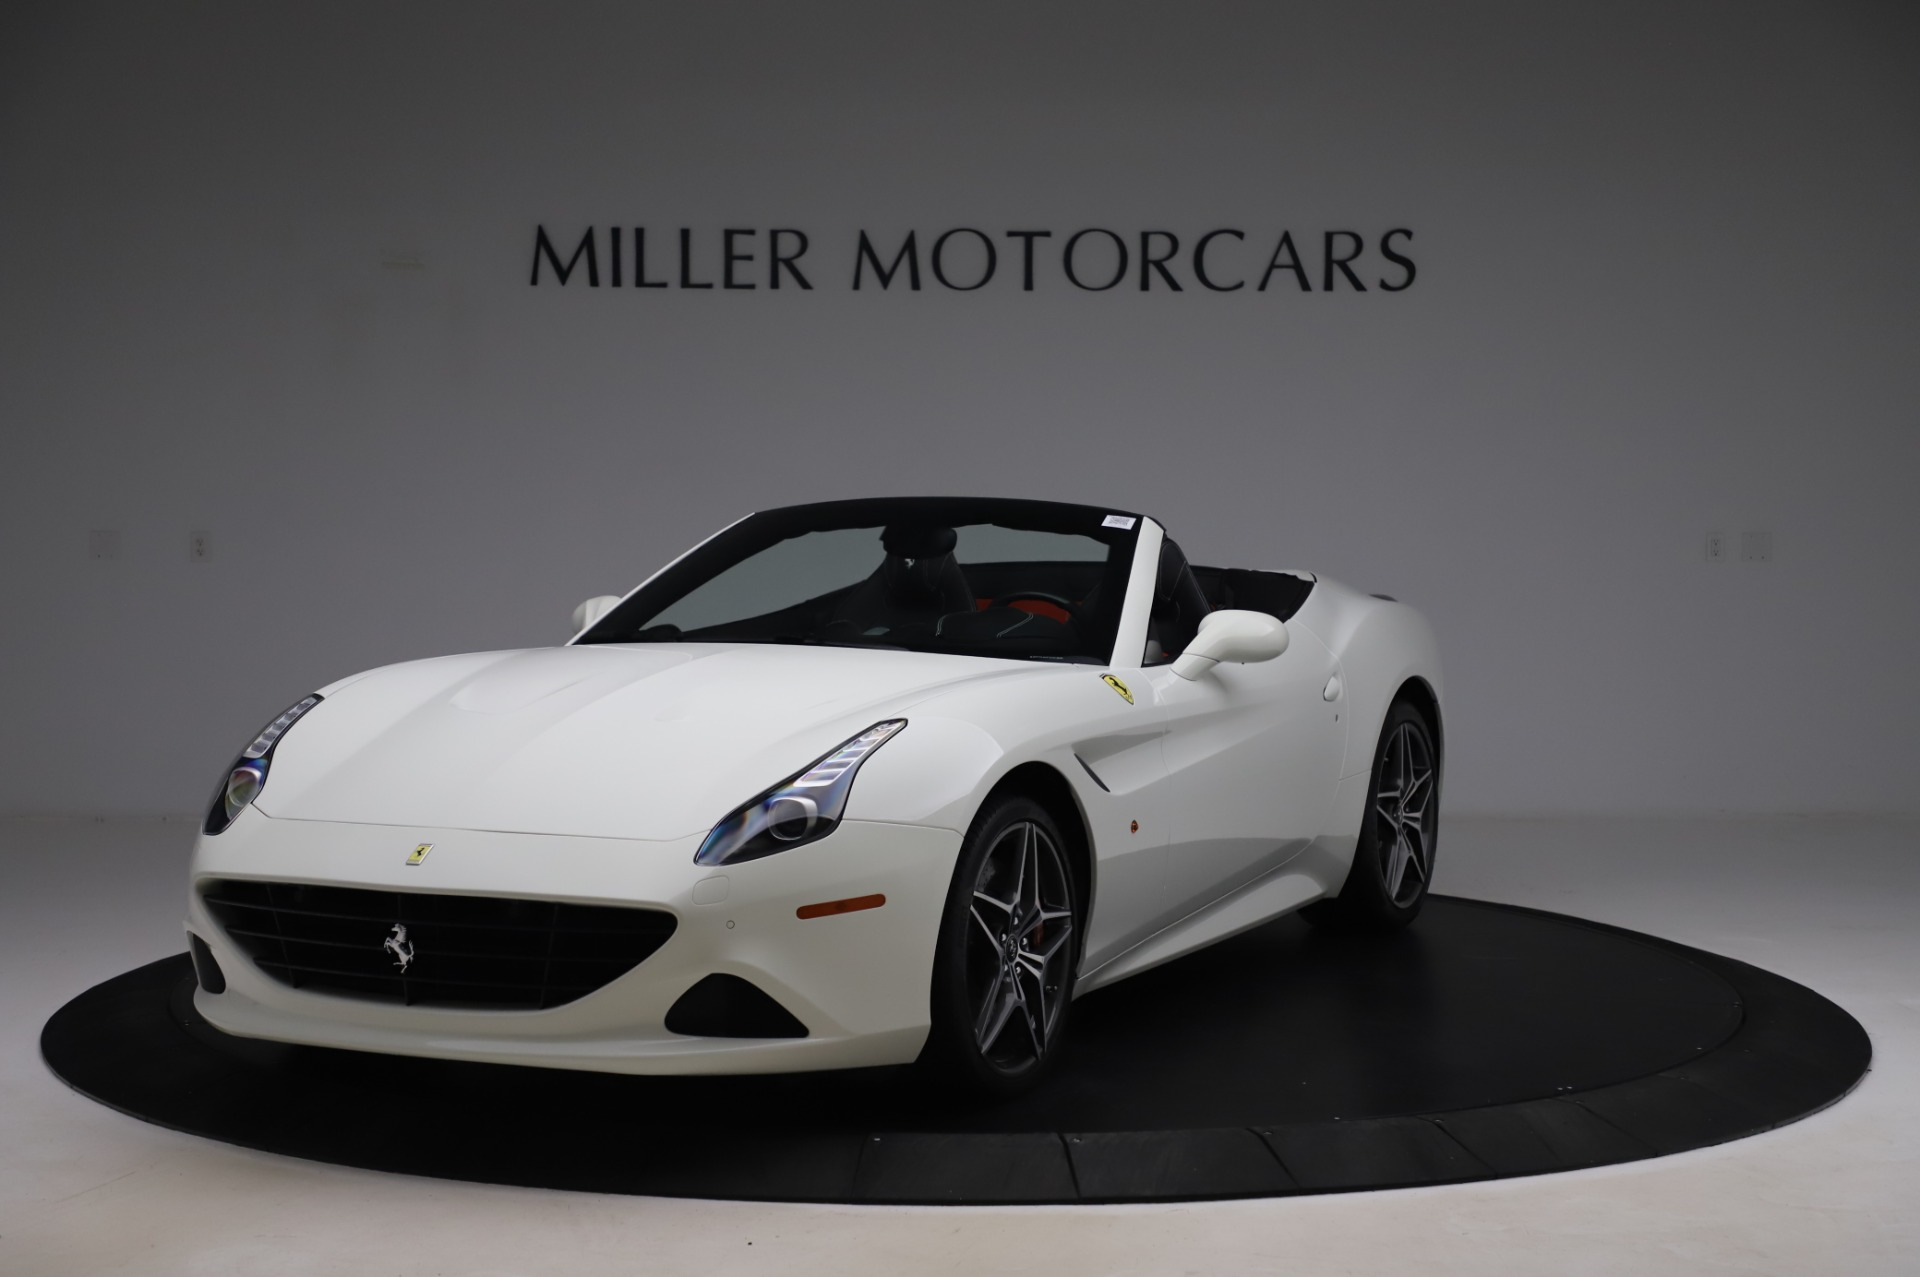 Used 2015 Ferrari California T for sale $159,900 at Pagani of Greenwich in Greenwich CT 06830 1